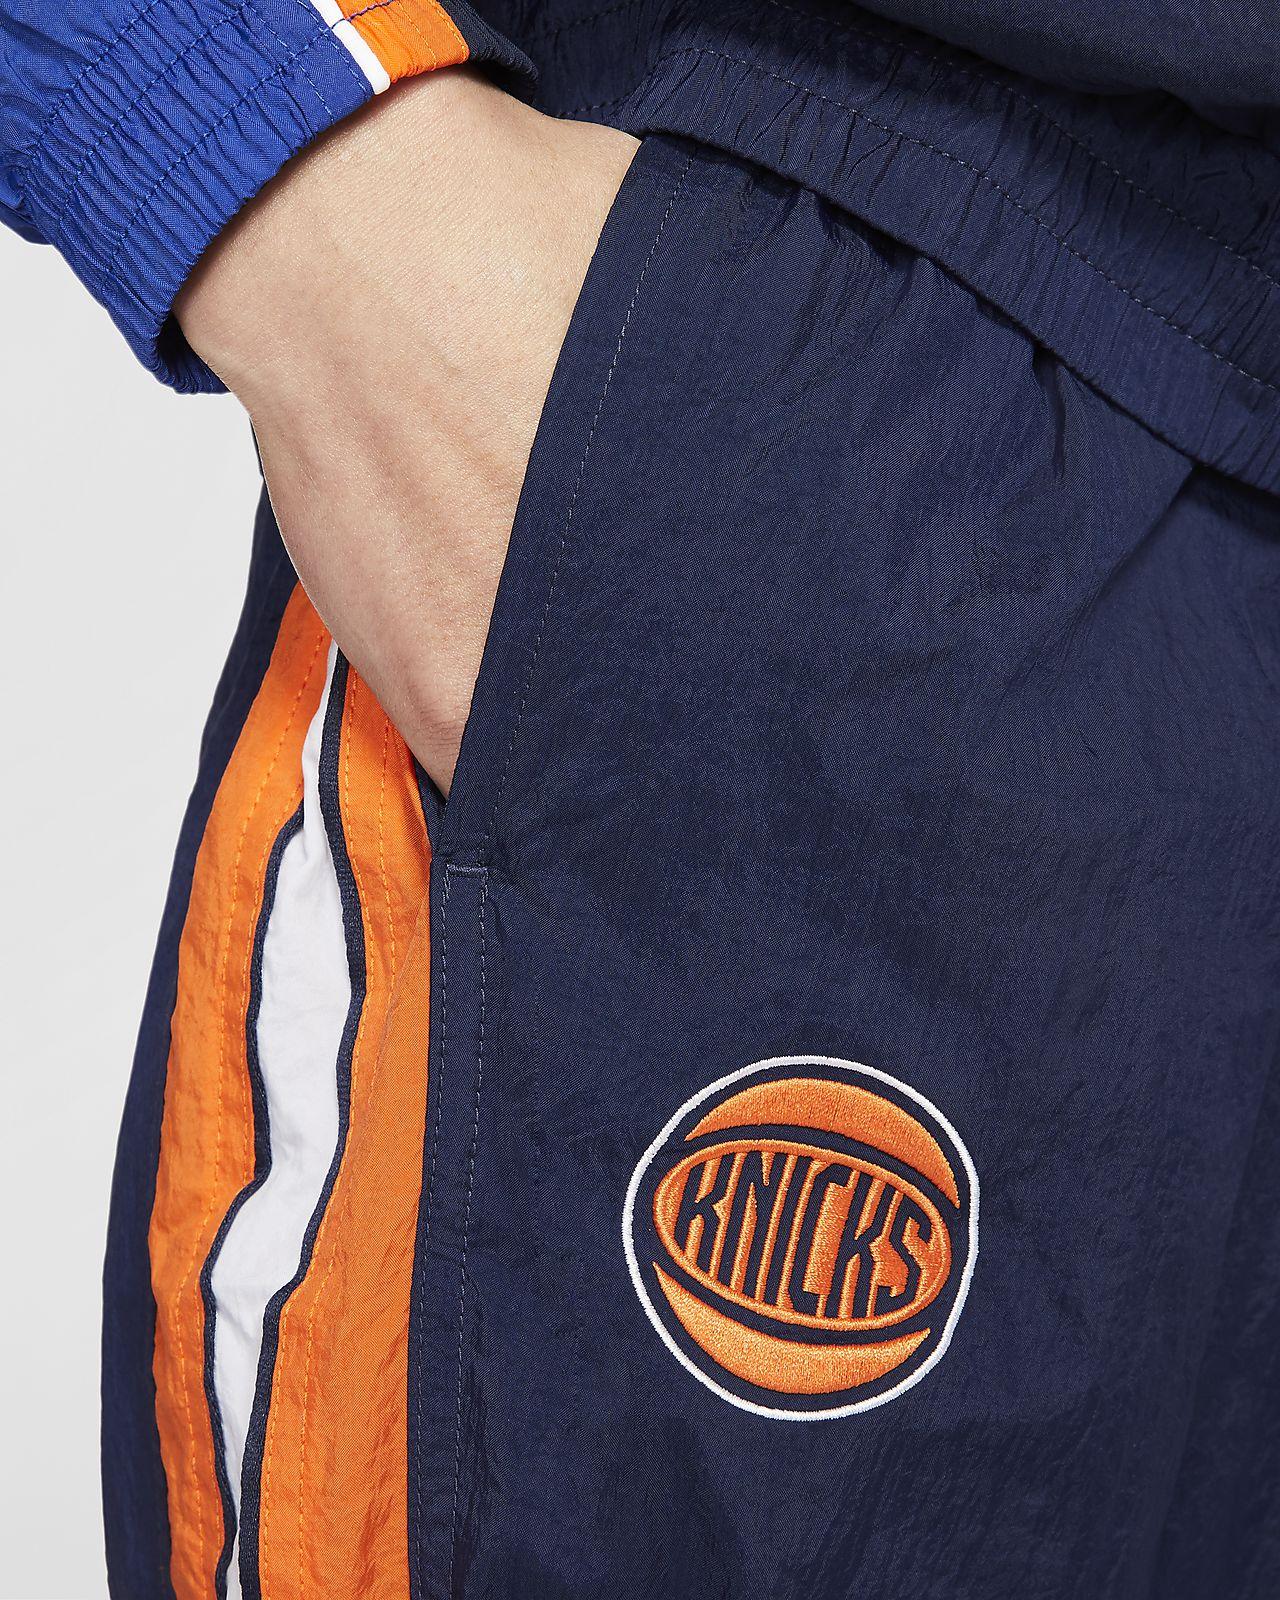 Knicks Courtside City Edition Nike NBA Trainingsanzug für Herren